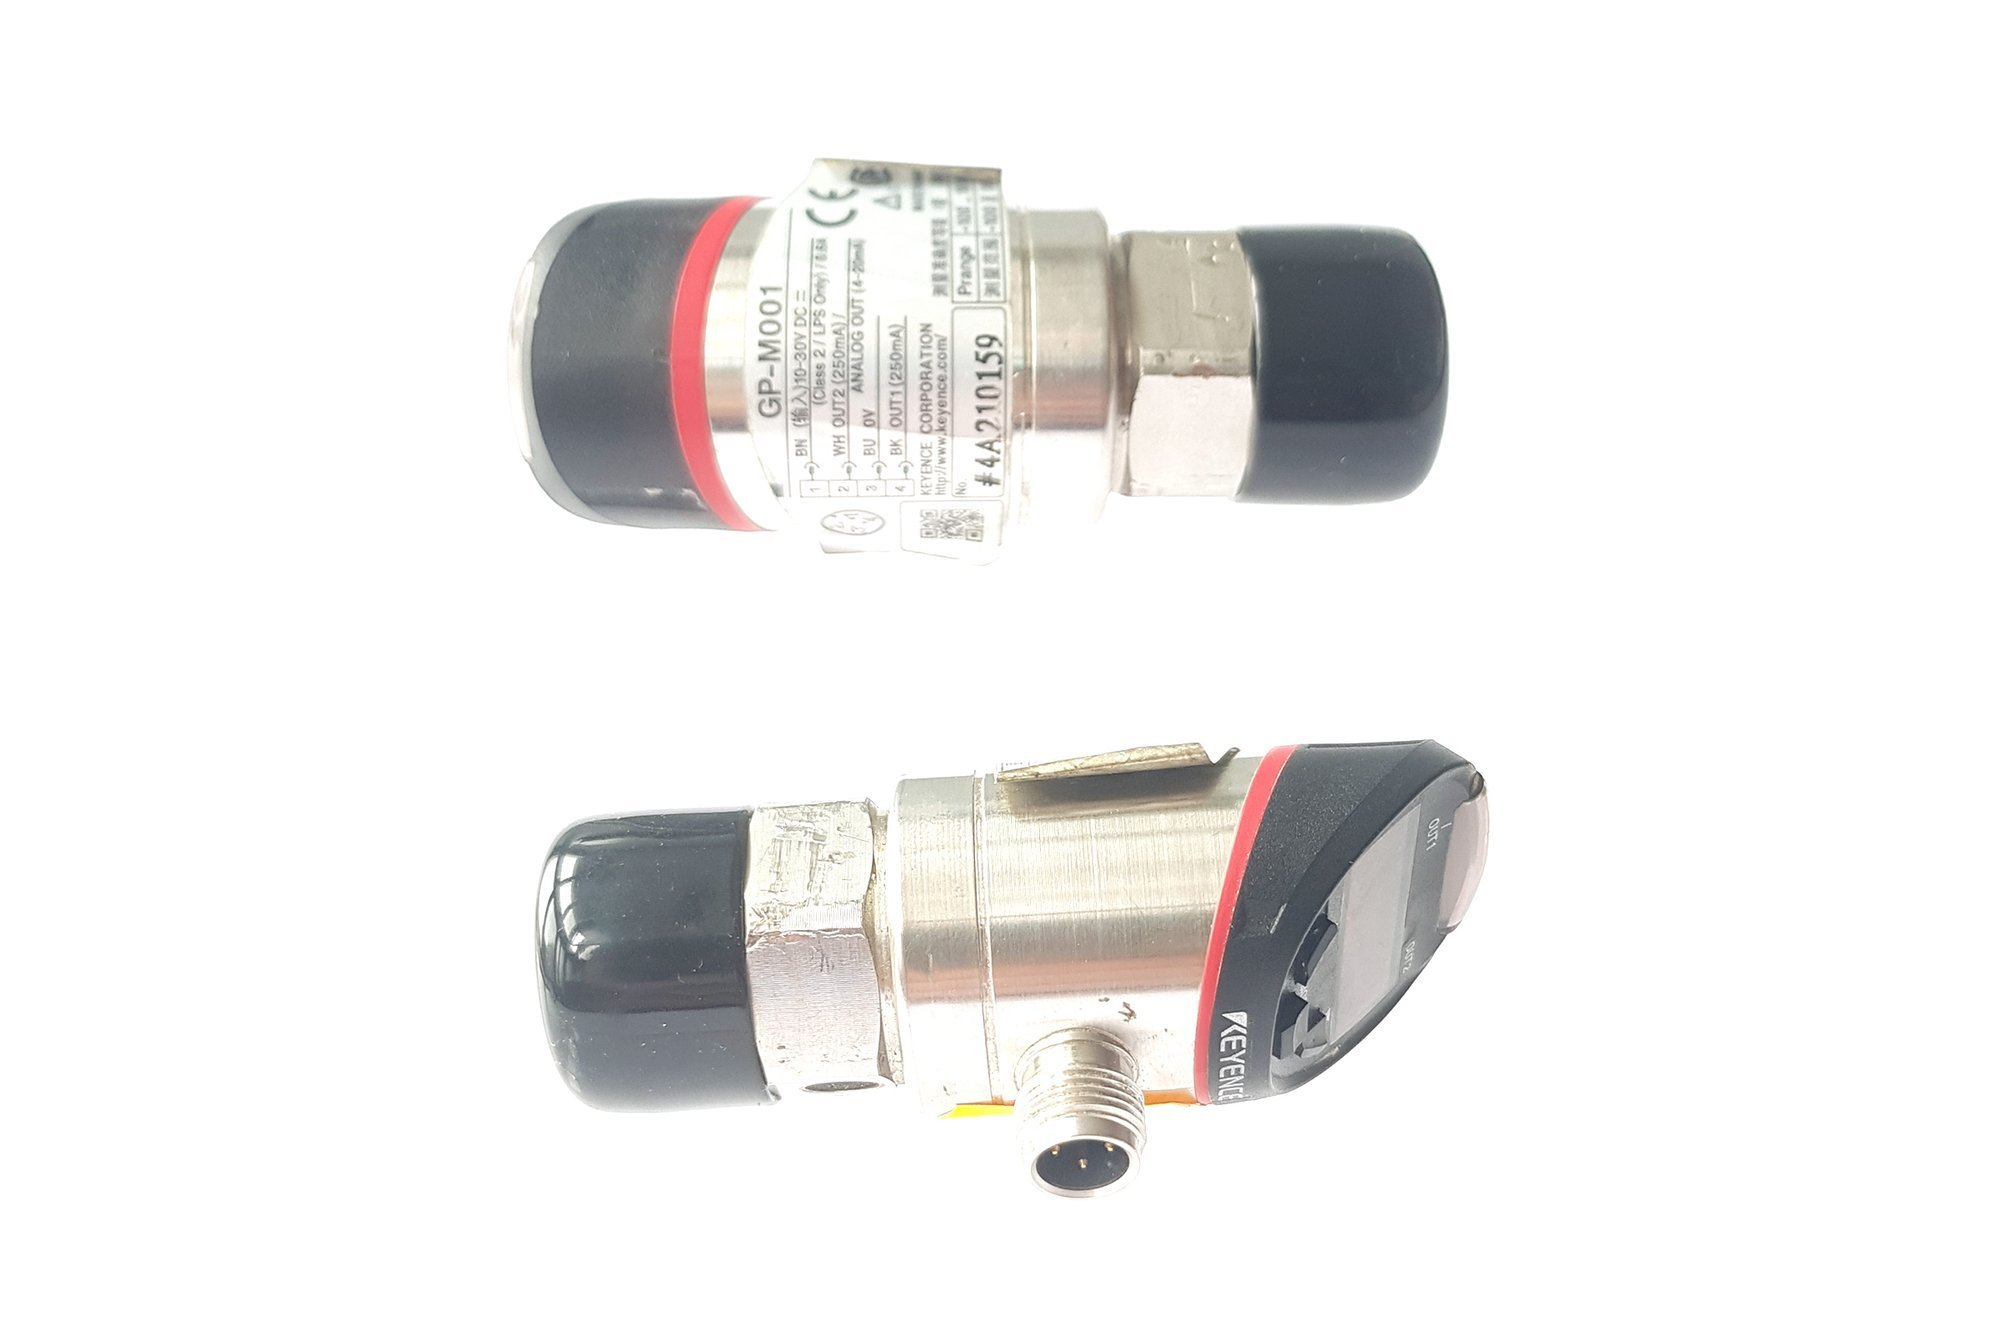 Keyence Heavy Duty Type Digital Pressure Sensor GP-M001